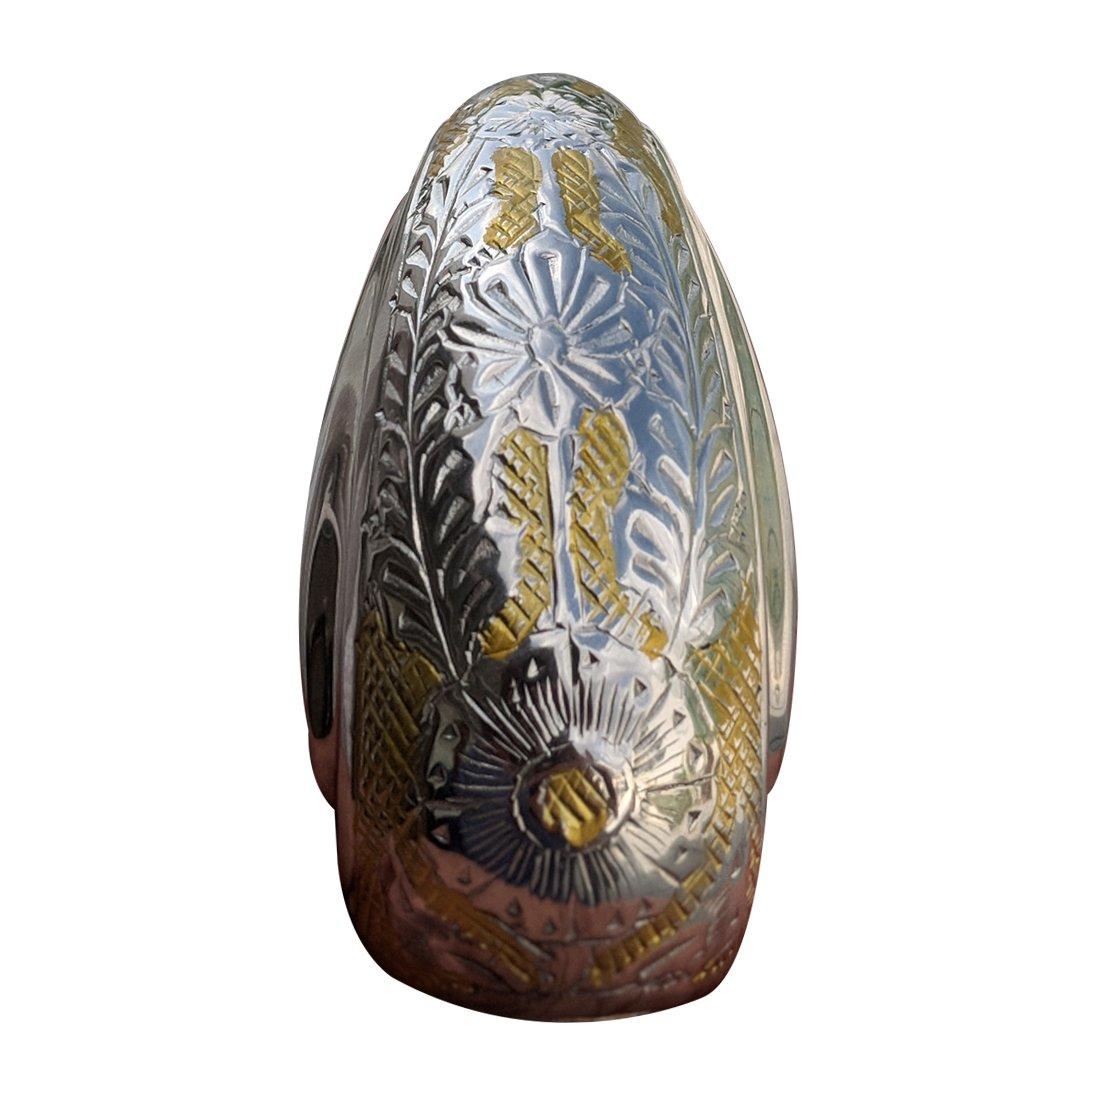 Home Decors Wattan Nickel Engraved Teardrop Small Keepsake Urn for Ashes, Mini Memorial Cremation Urn